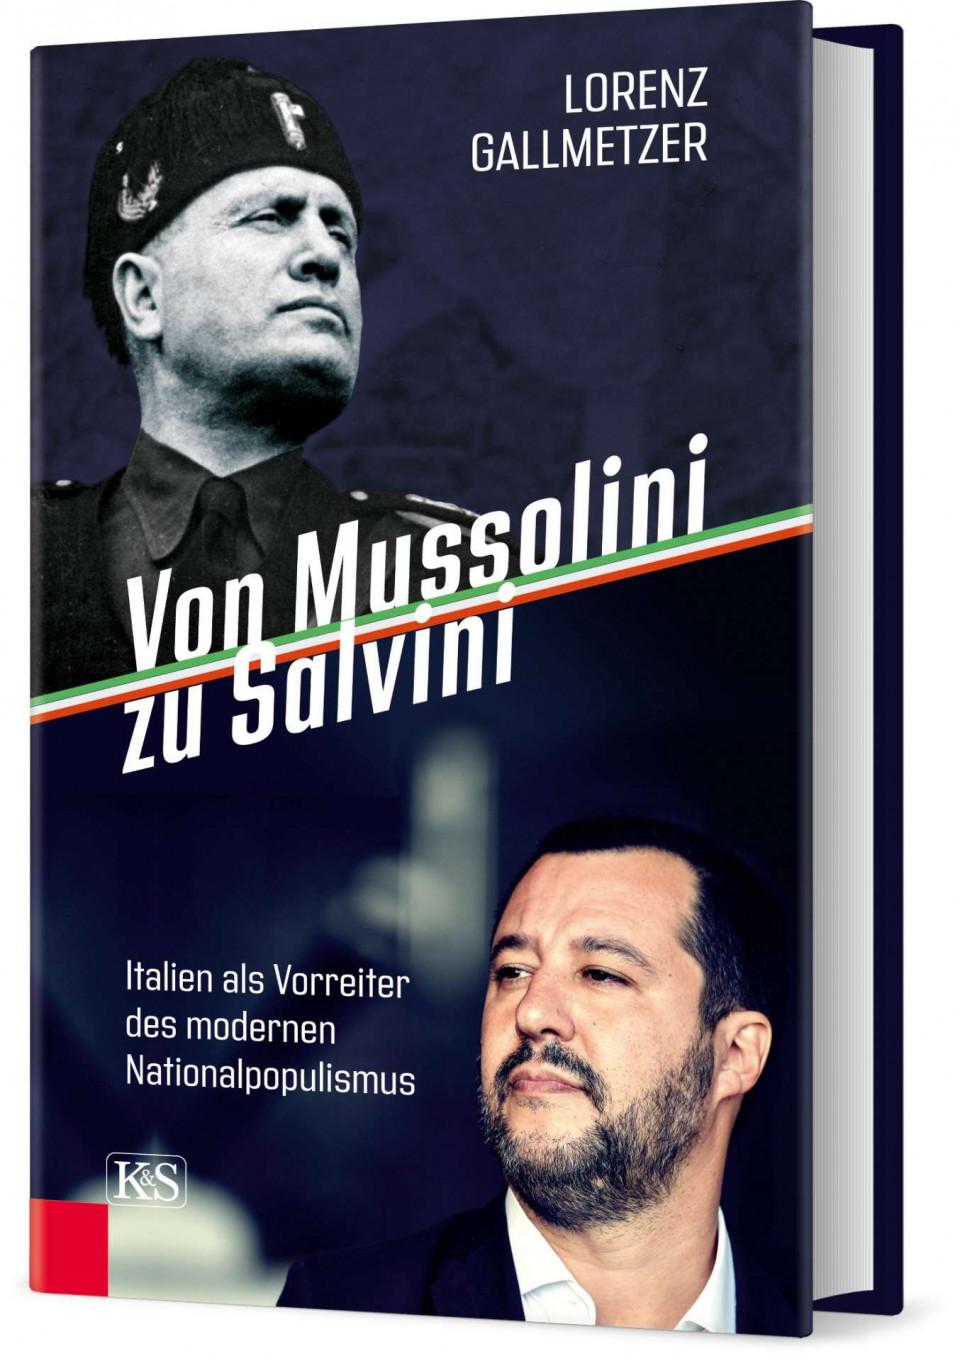 xvon_mussolini_zu_salvini.jpg.pagespeed.ic_.mdnlxxbpuv.jpg